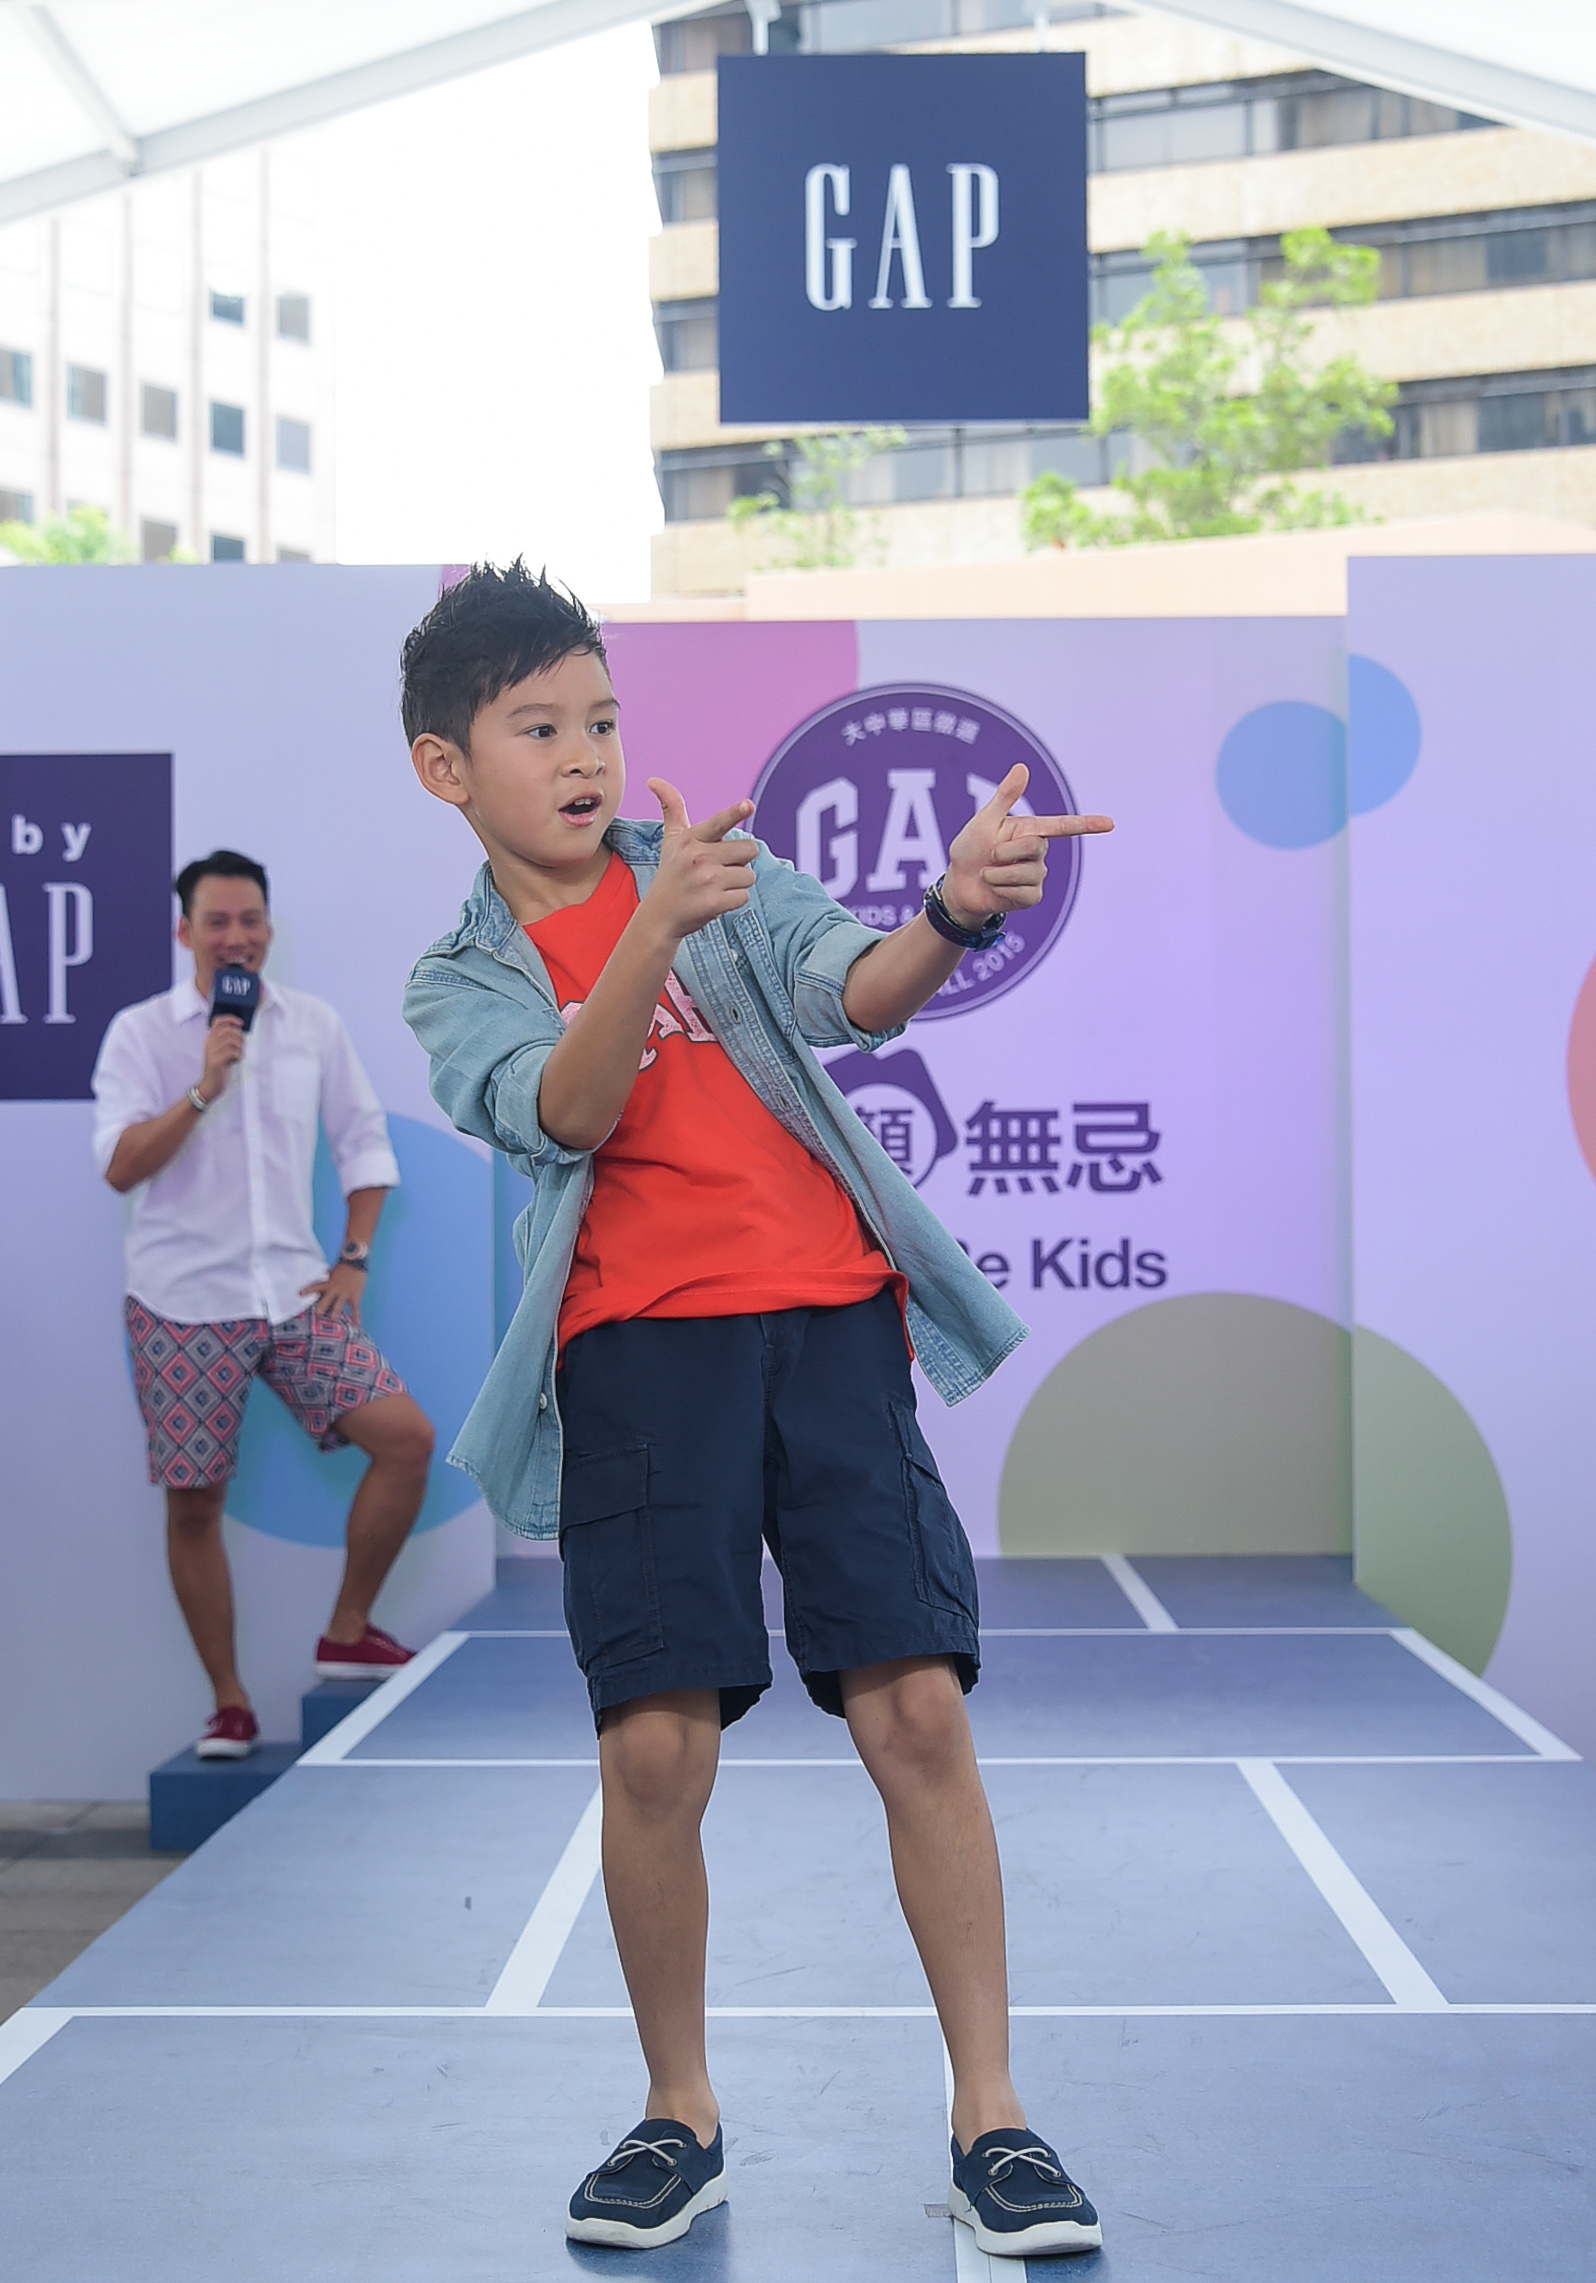 Ryder為Gap Casting Call全球小小代言人征選大中華區活動巡演獻上首次走秀